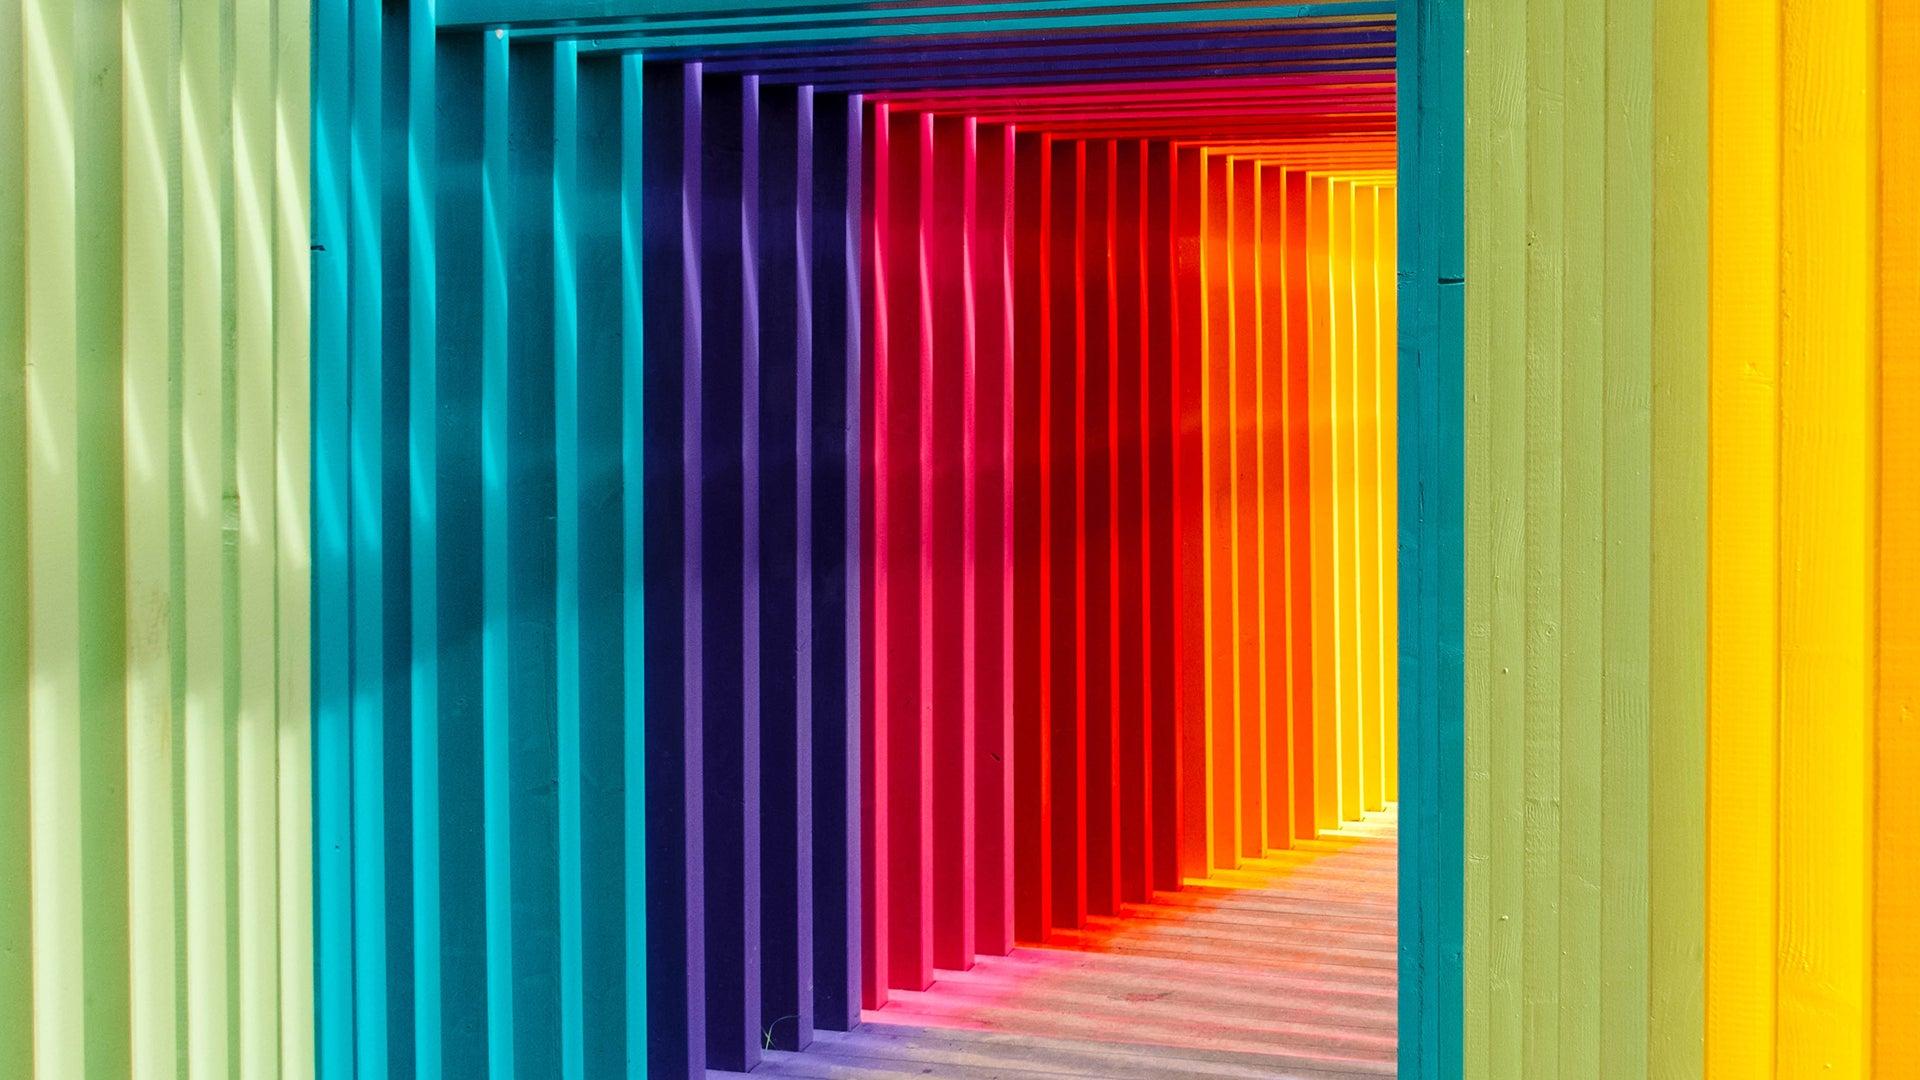 A corridor made up of multicoloured walls